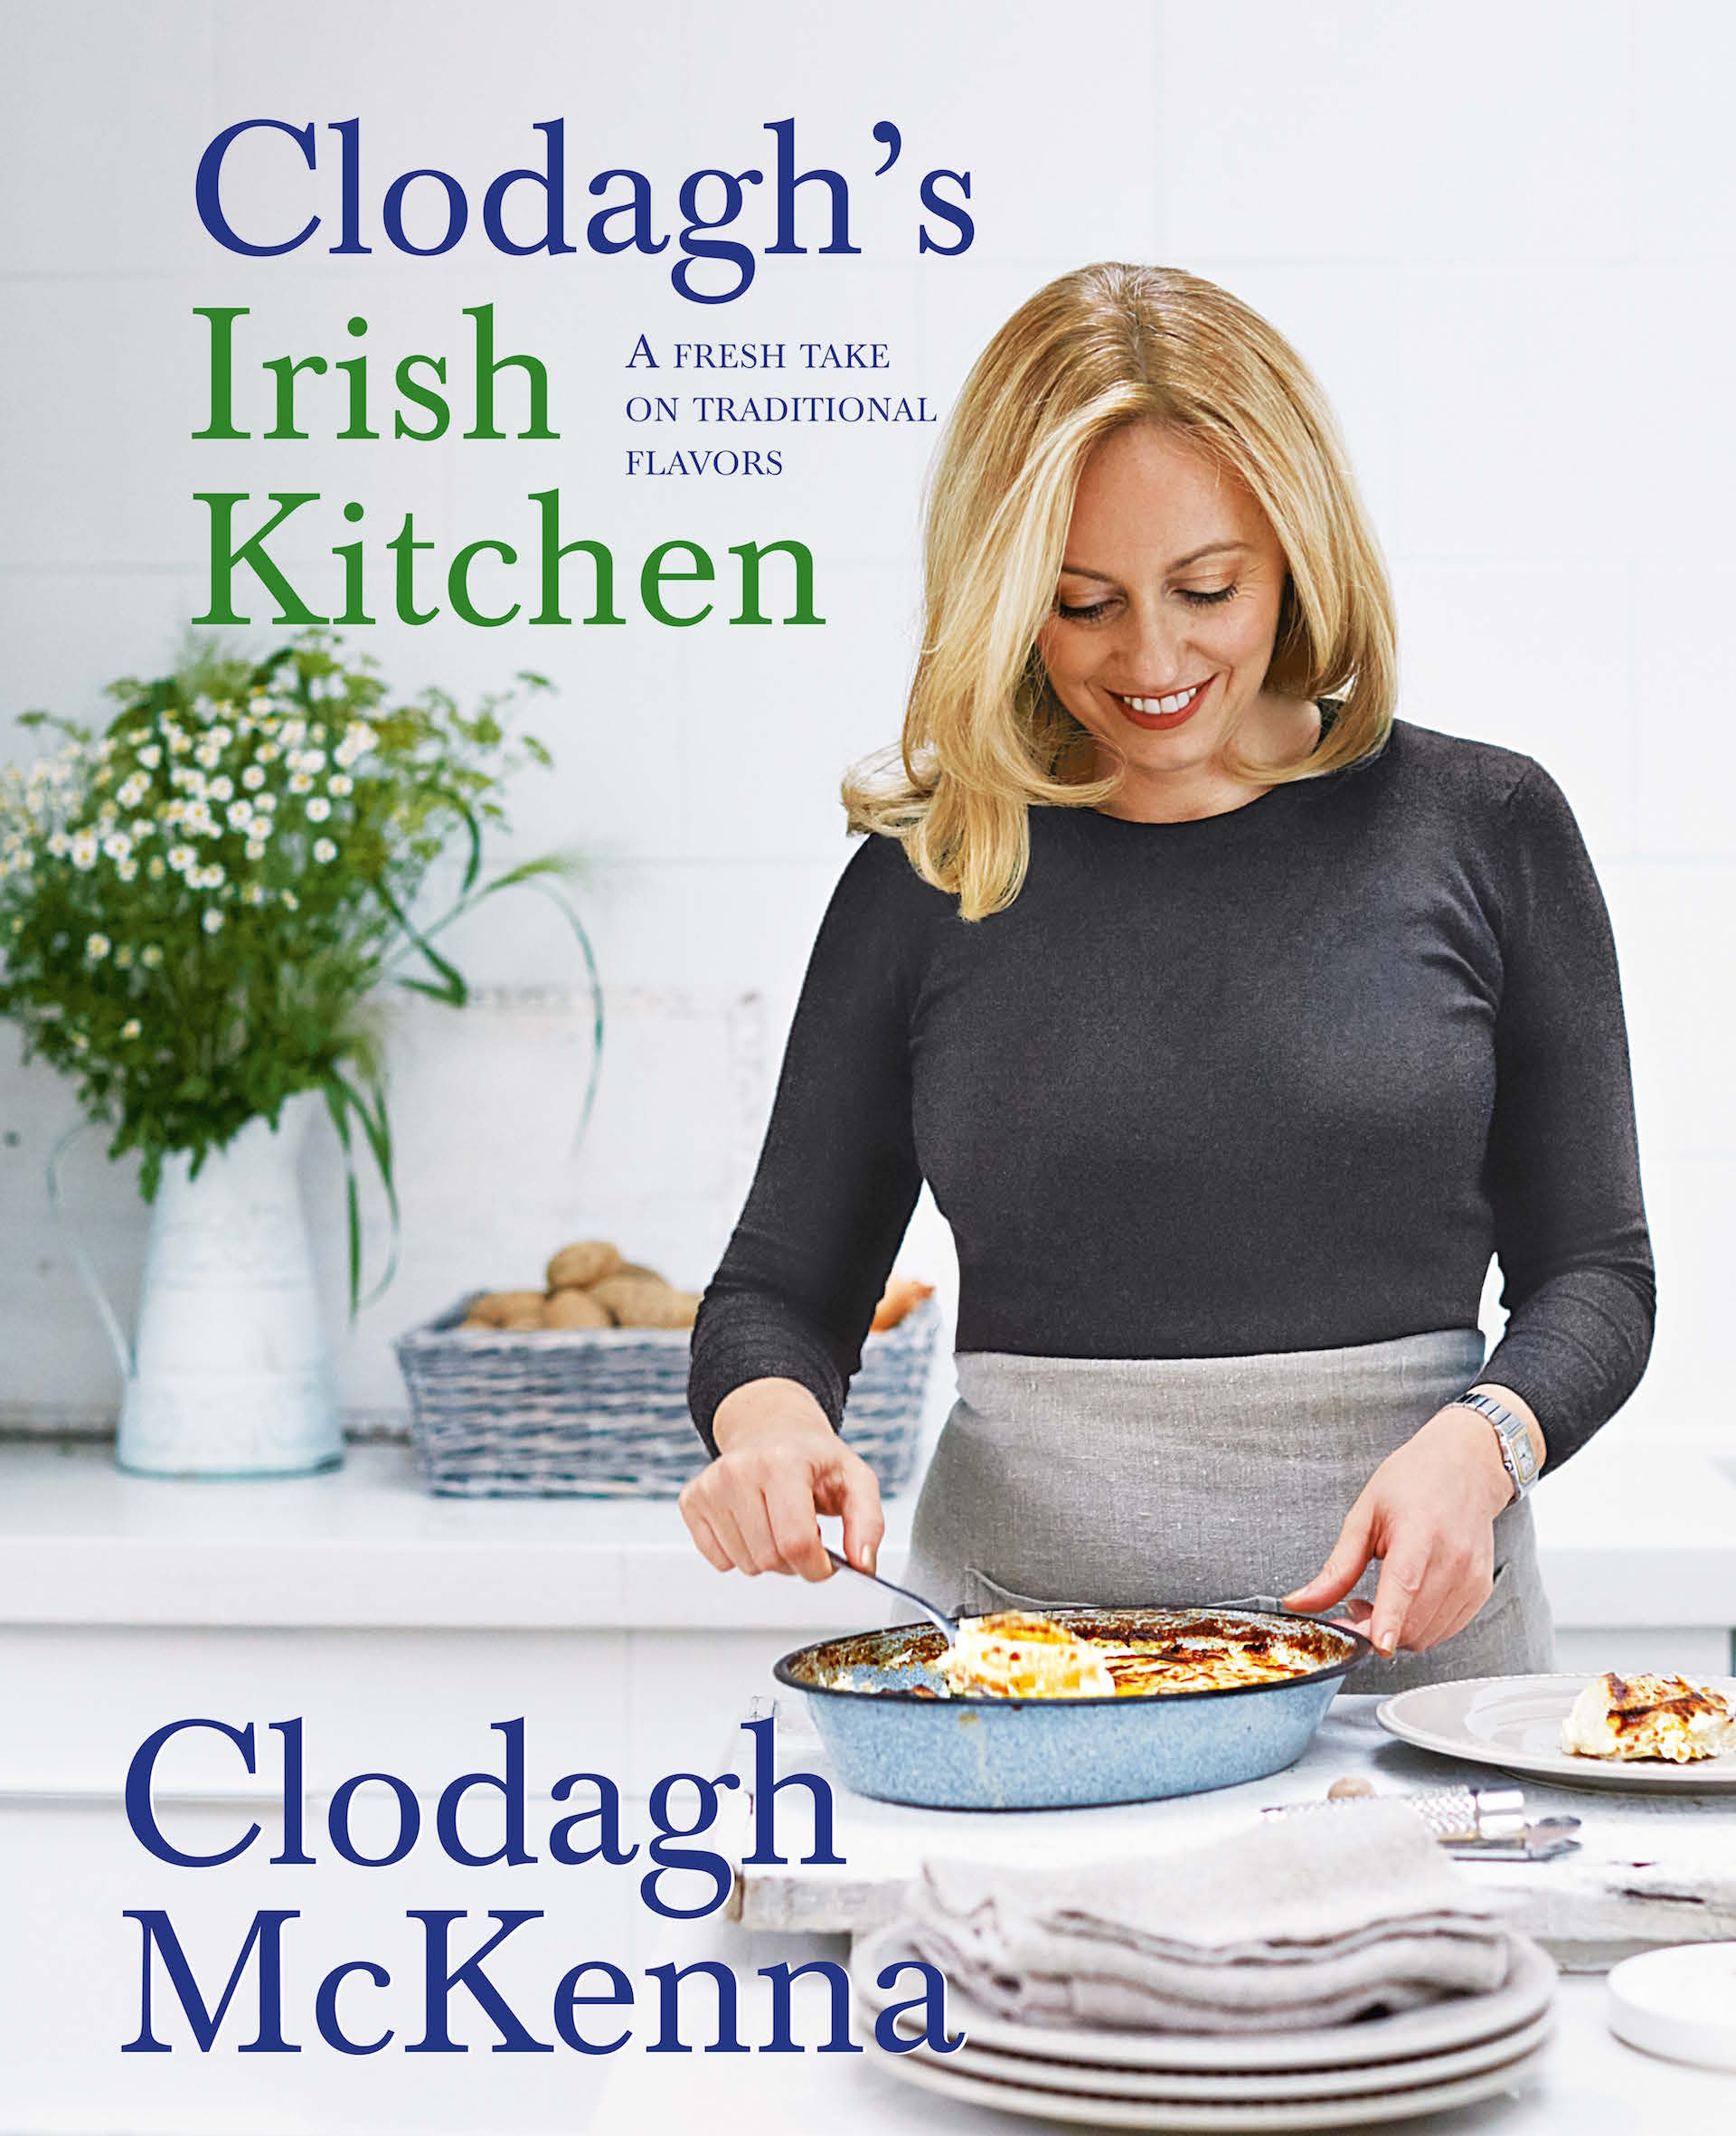 clodagh's irish kitchen